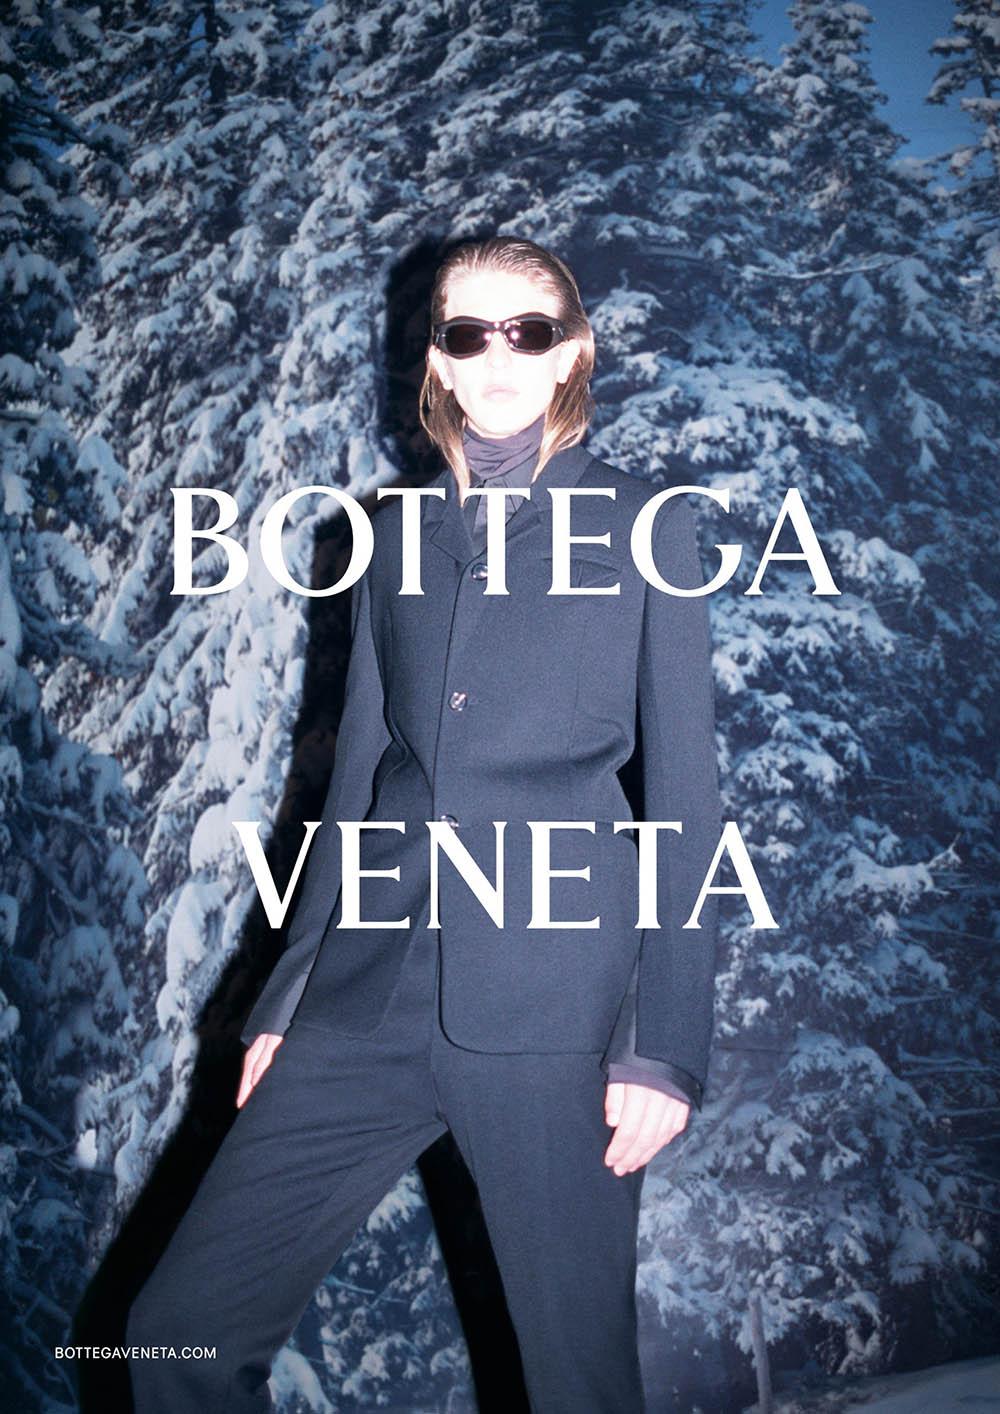 Bottega Veneta Fall Winter 2020 Campaign